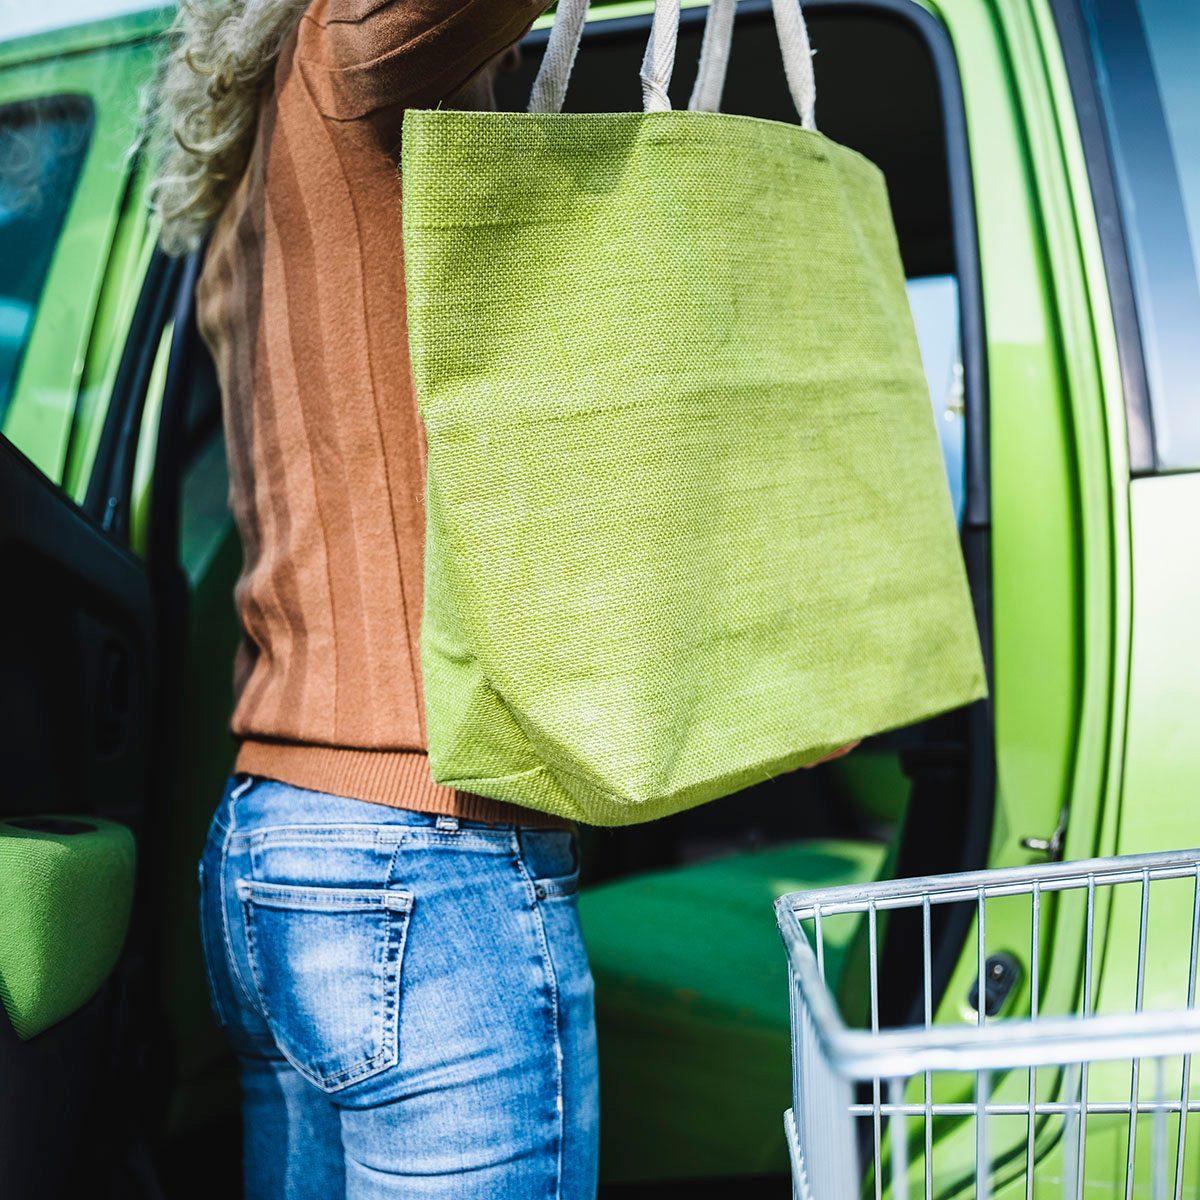 Woman using Reusable Shopping Bags uses for reusable bags